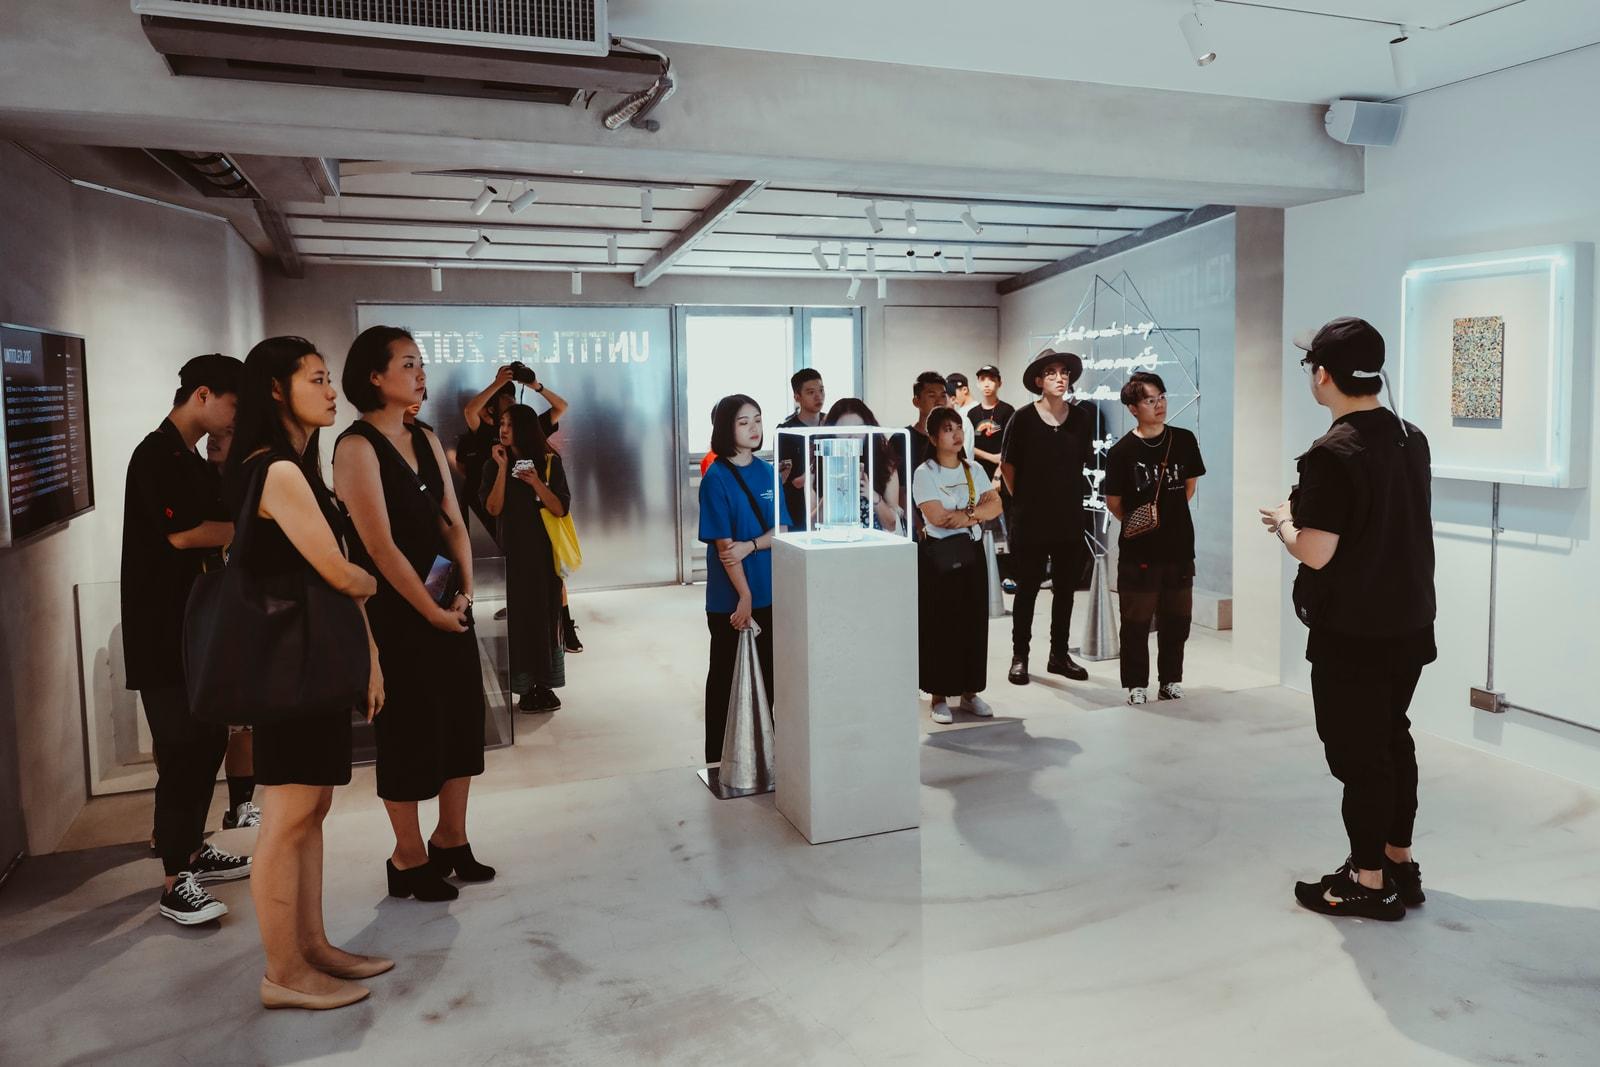 HYPEBEAST 現場直擊 G-Dragon 之「UNTITLED, 2017 無題藝術展」